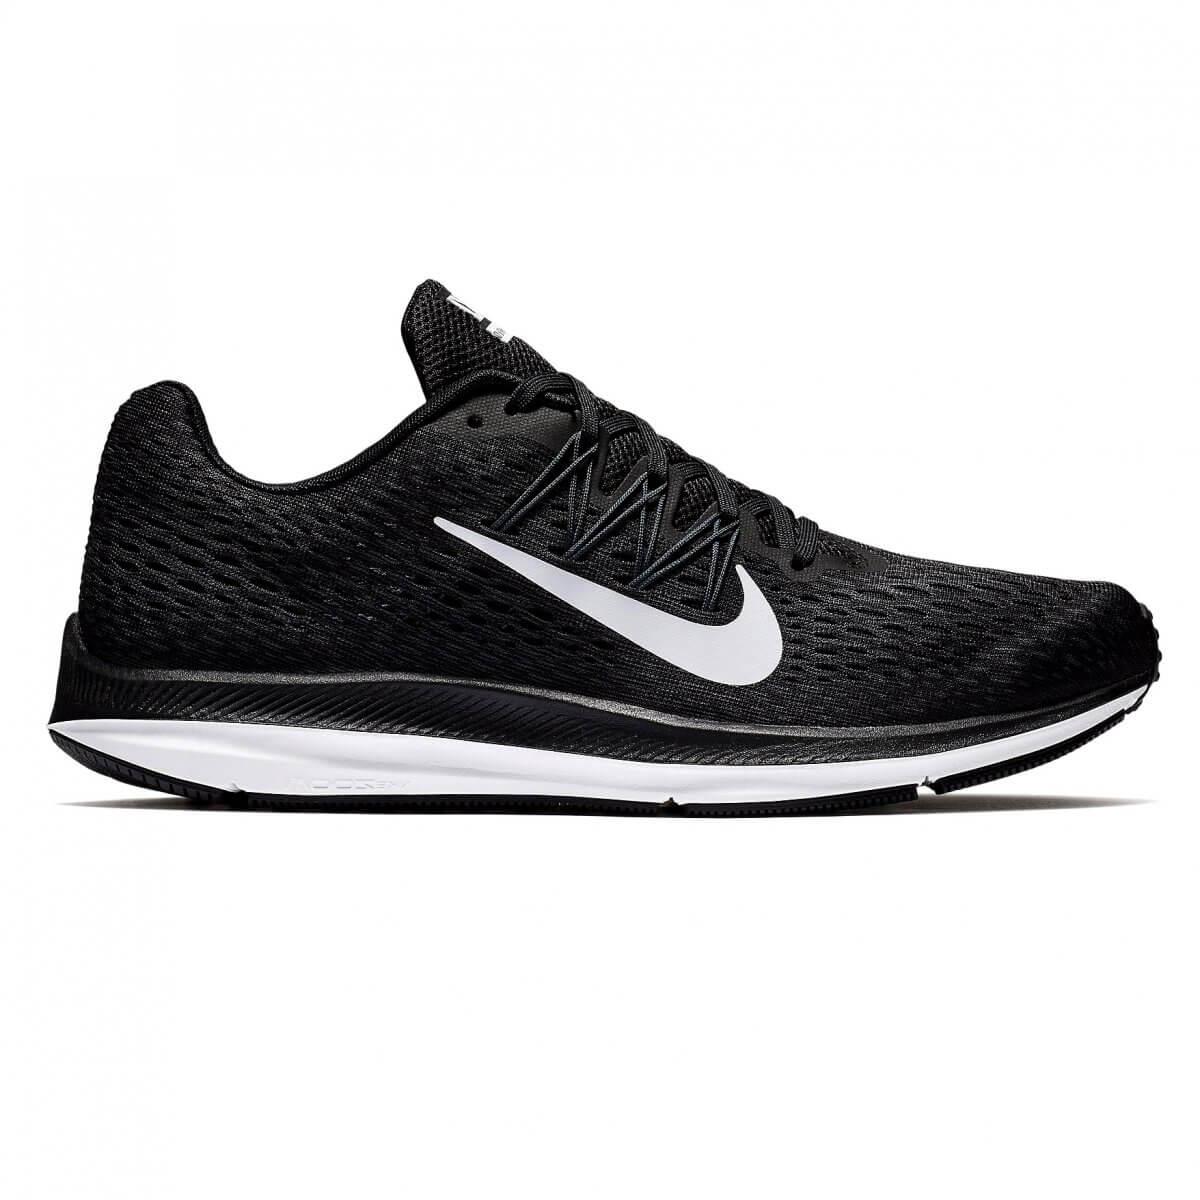 6c4896ada8 Tênis Running Masculino Nike Zoom Winflo 5 AA7406-001 - Preto Branco ...